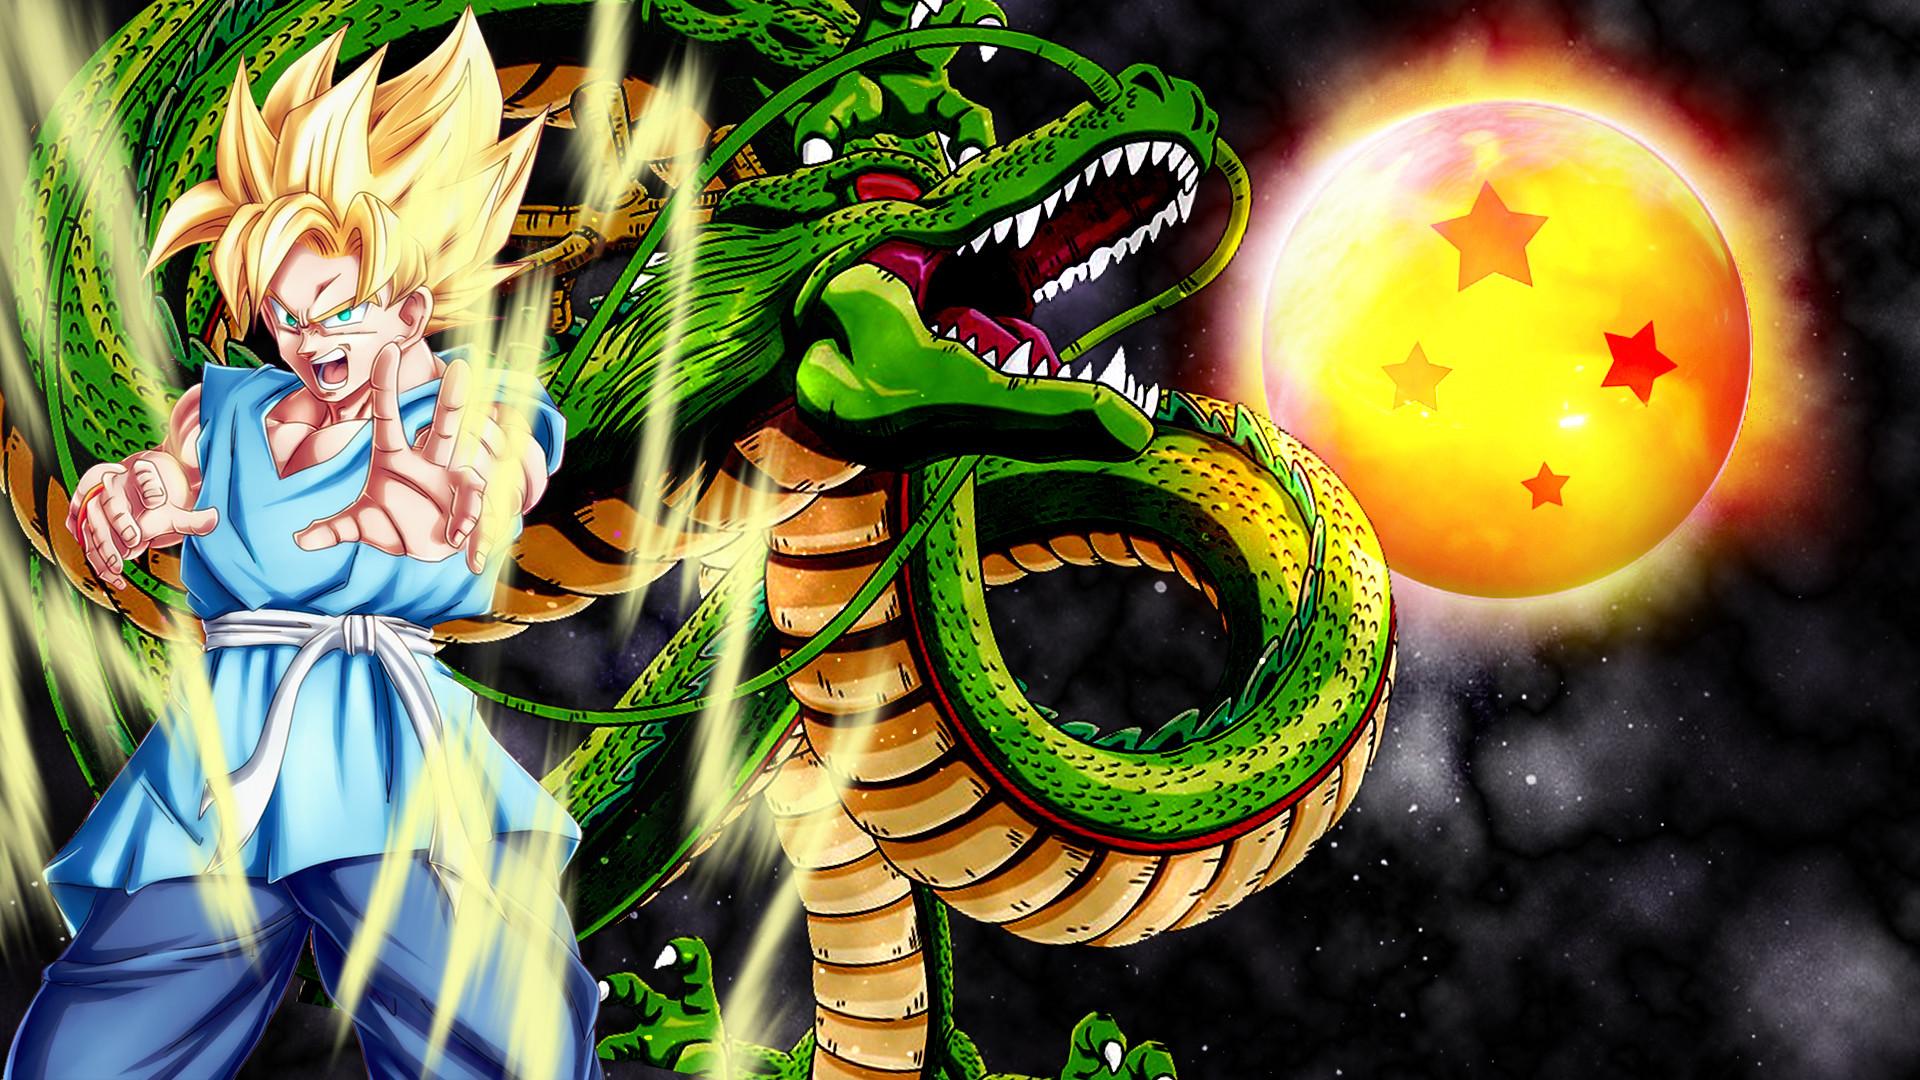 Goku Super Saiyan 7 Wallpaper Super gogeta super saiyan 4 1920x1080